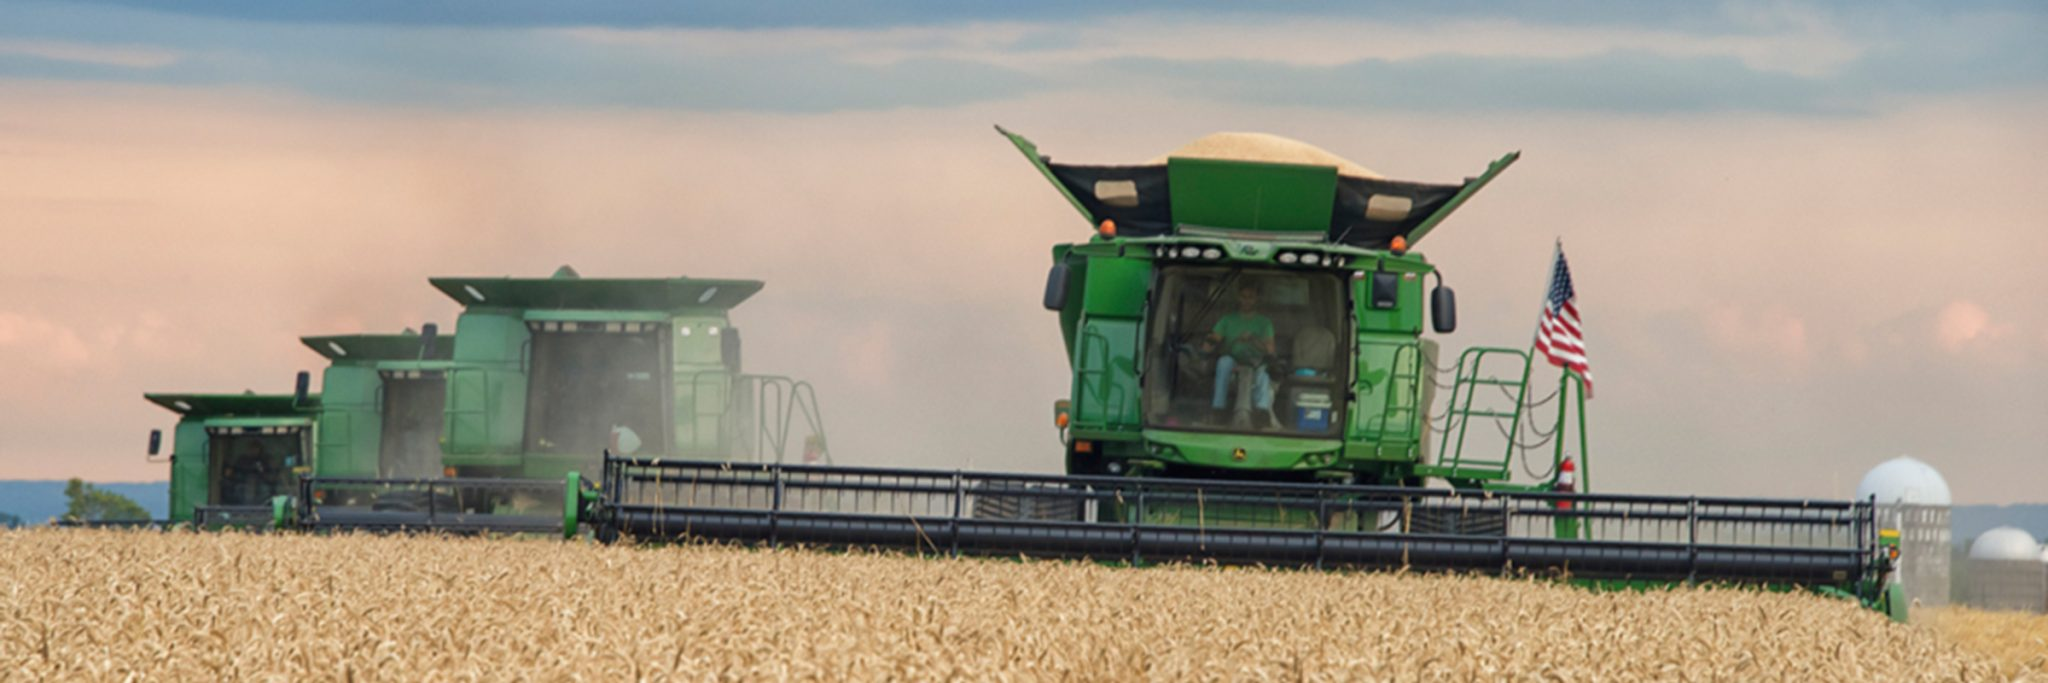 Photo of farm equipment